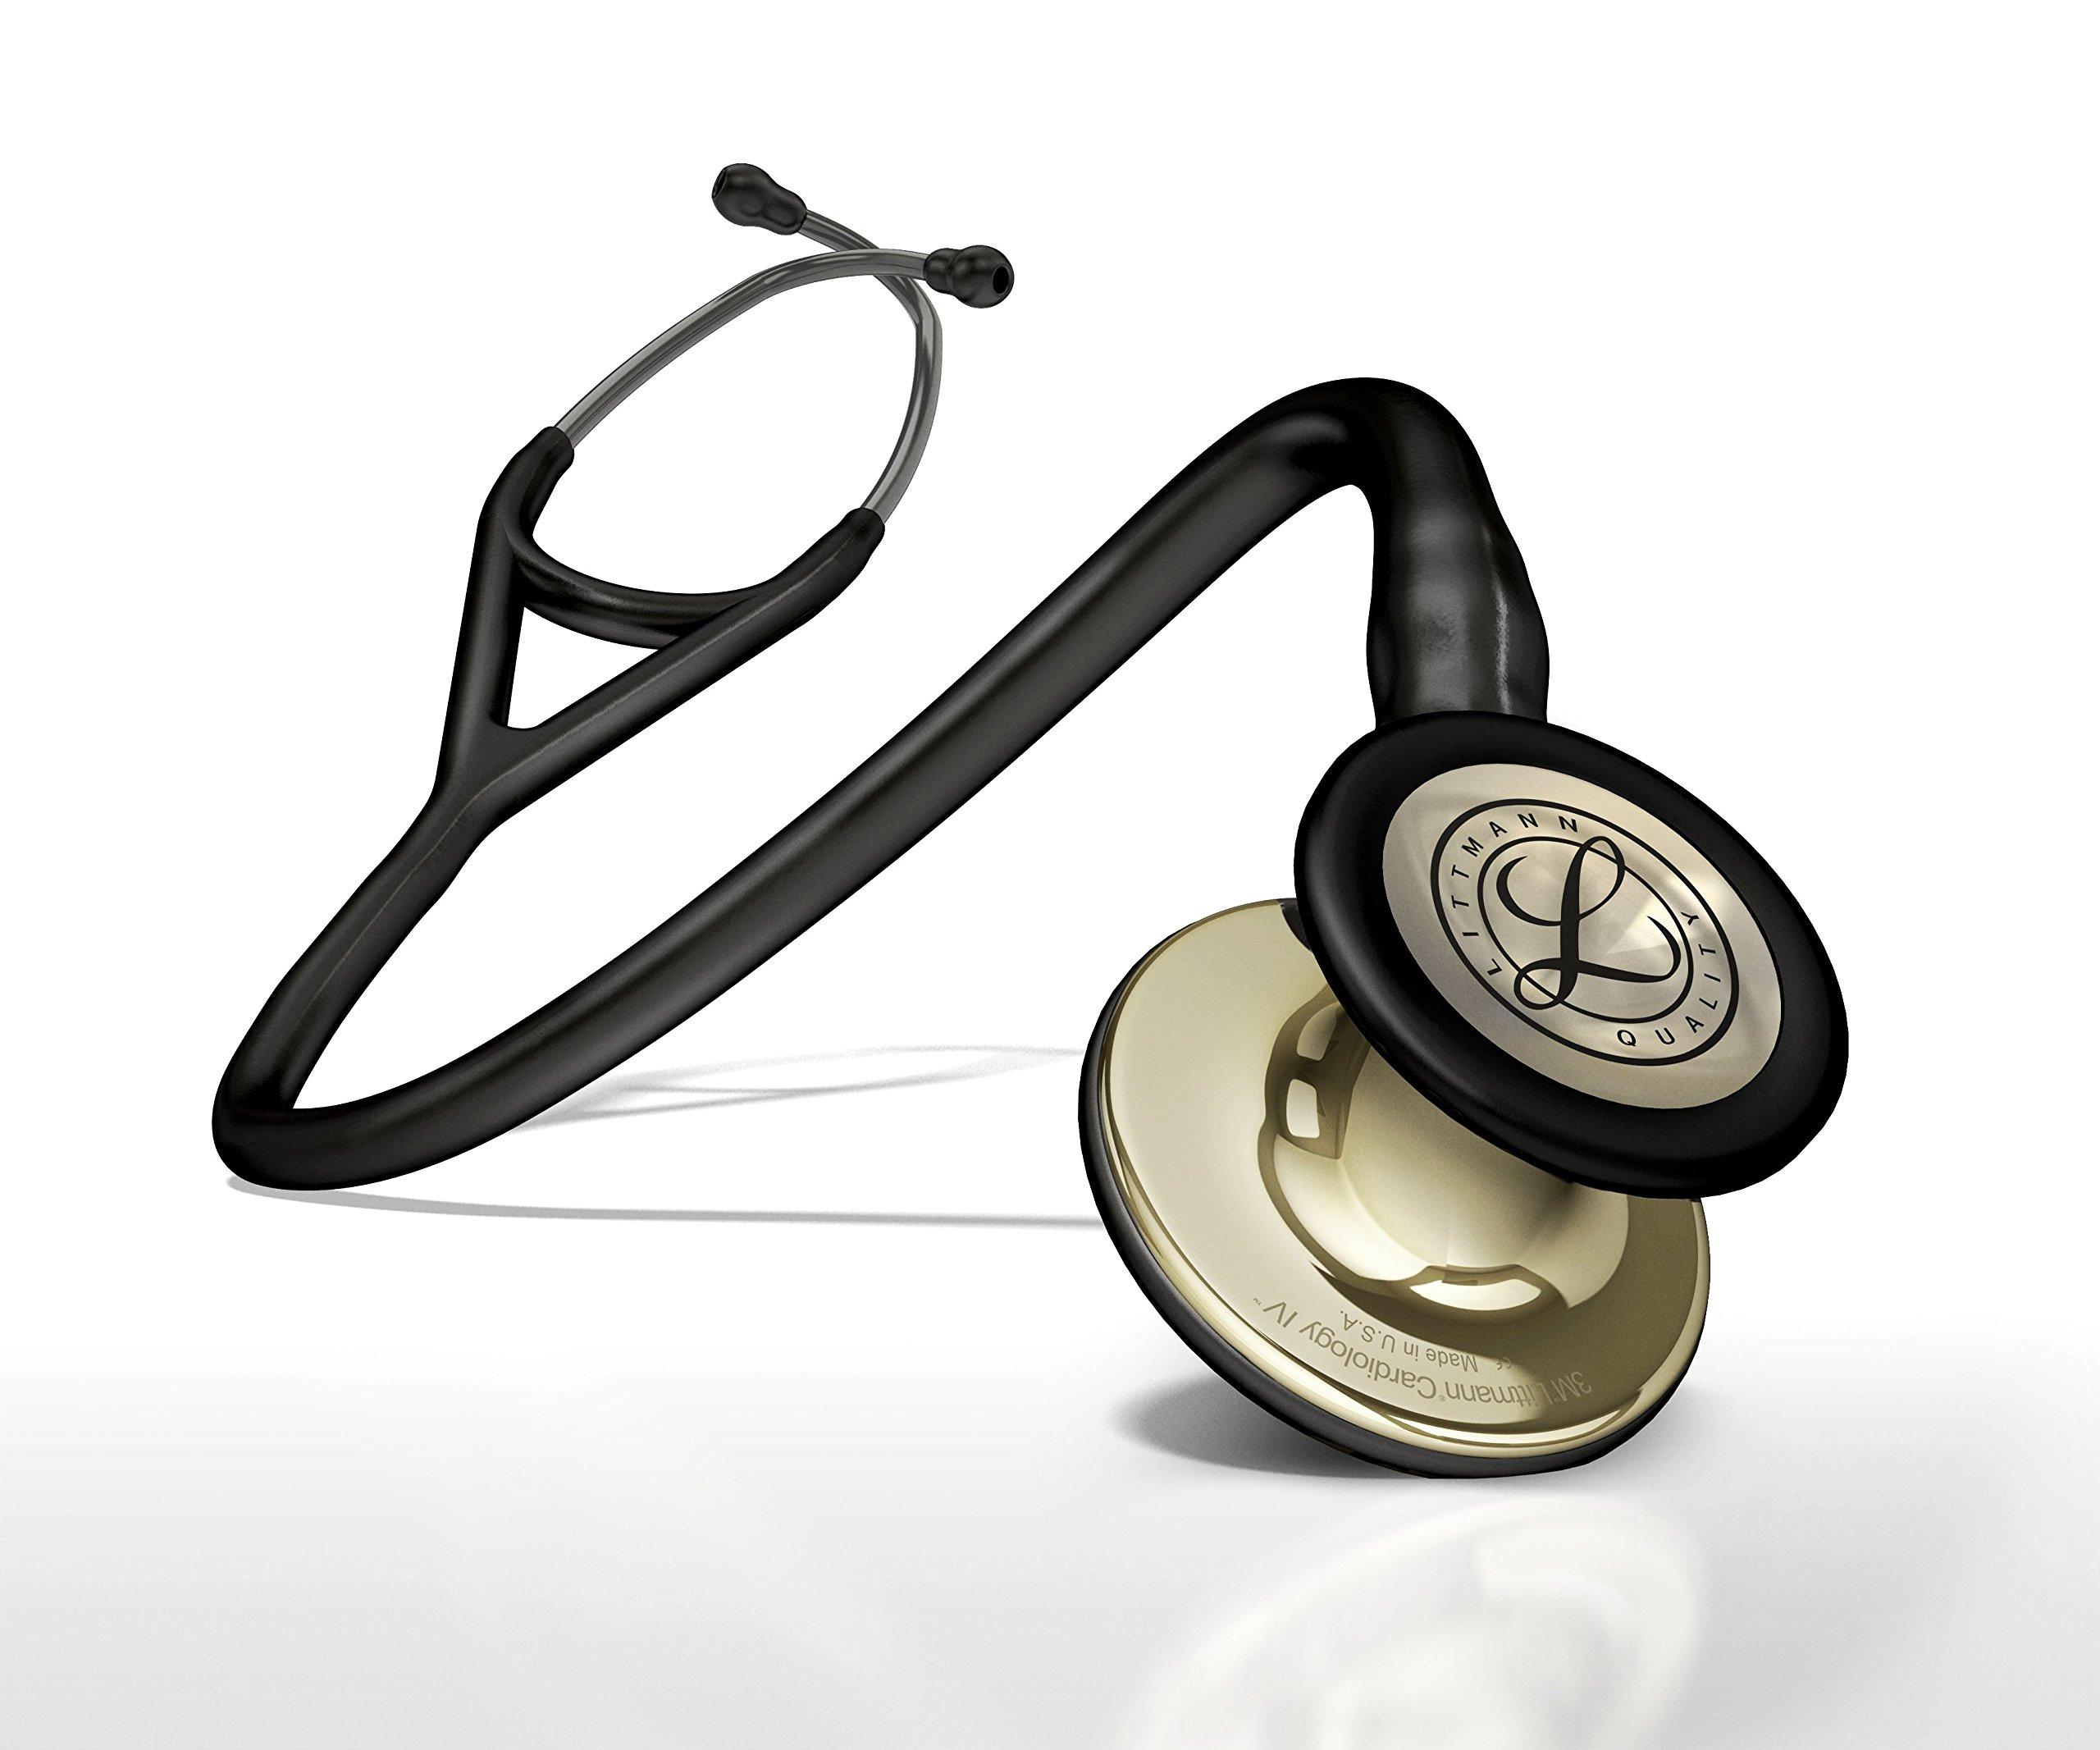 3M Littmann Cardiology IV Diagnostic Stethoscope, Champagne-Finish Chestpiece, Black Tube, Smoke Stem and Headset, 27 inch, 6179 by 3M Littmann (Image #6)